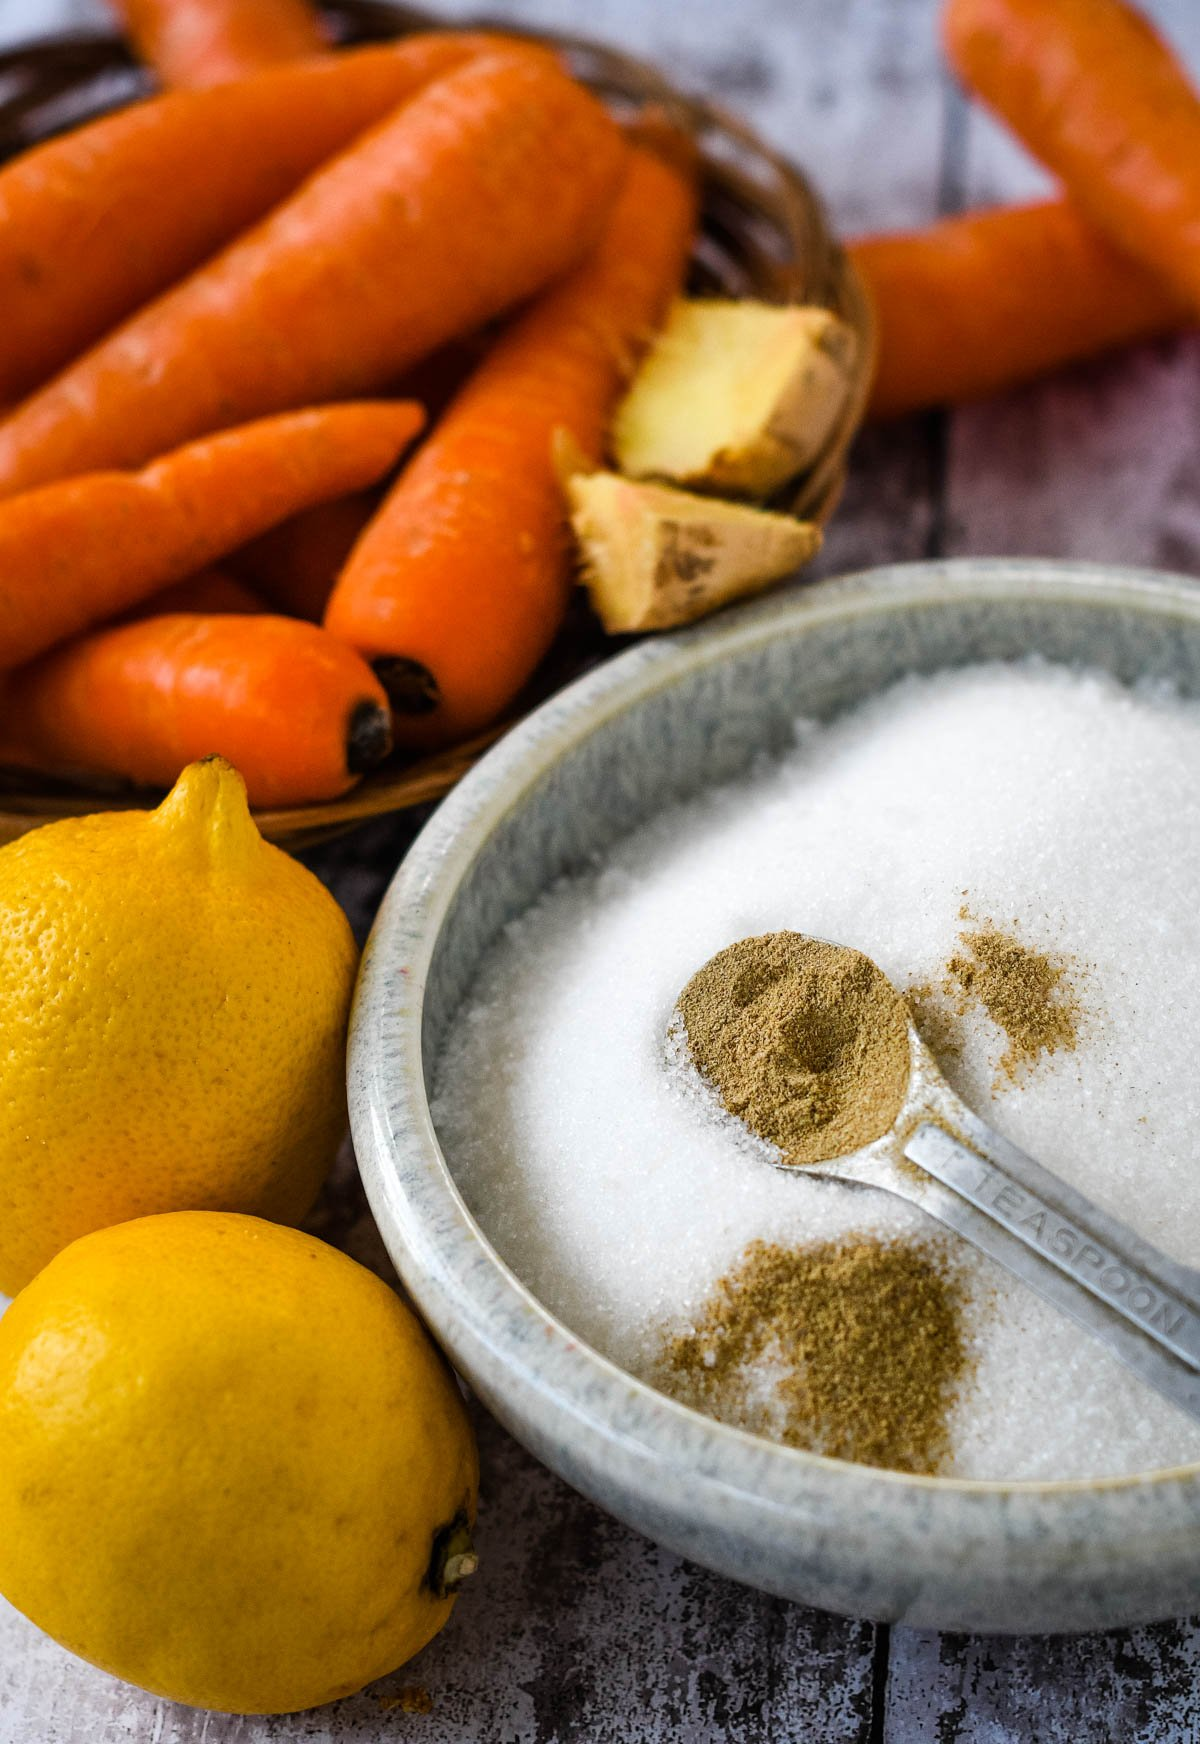 ingredients for carrot and lemon jam